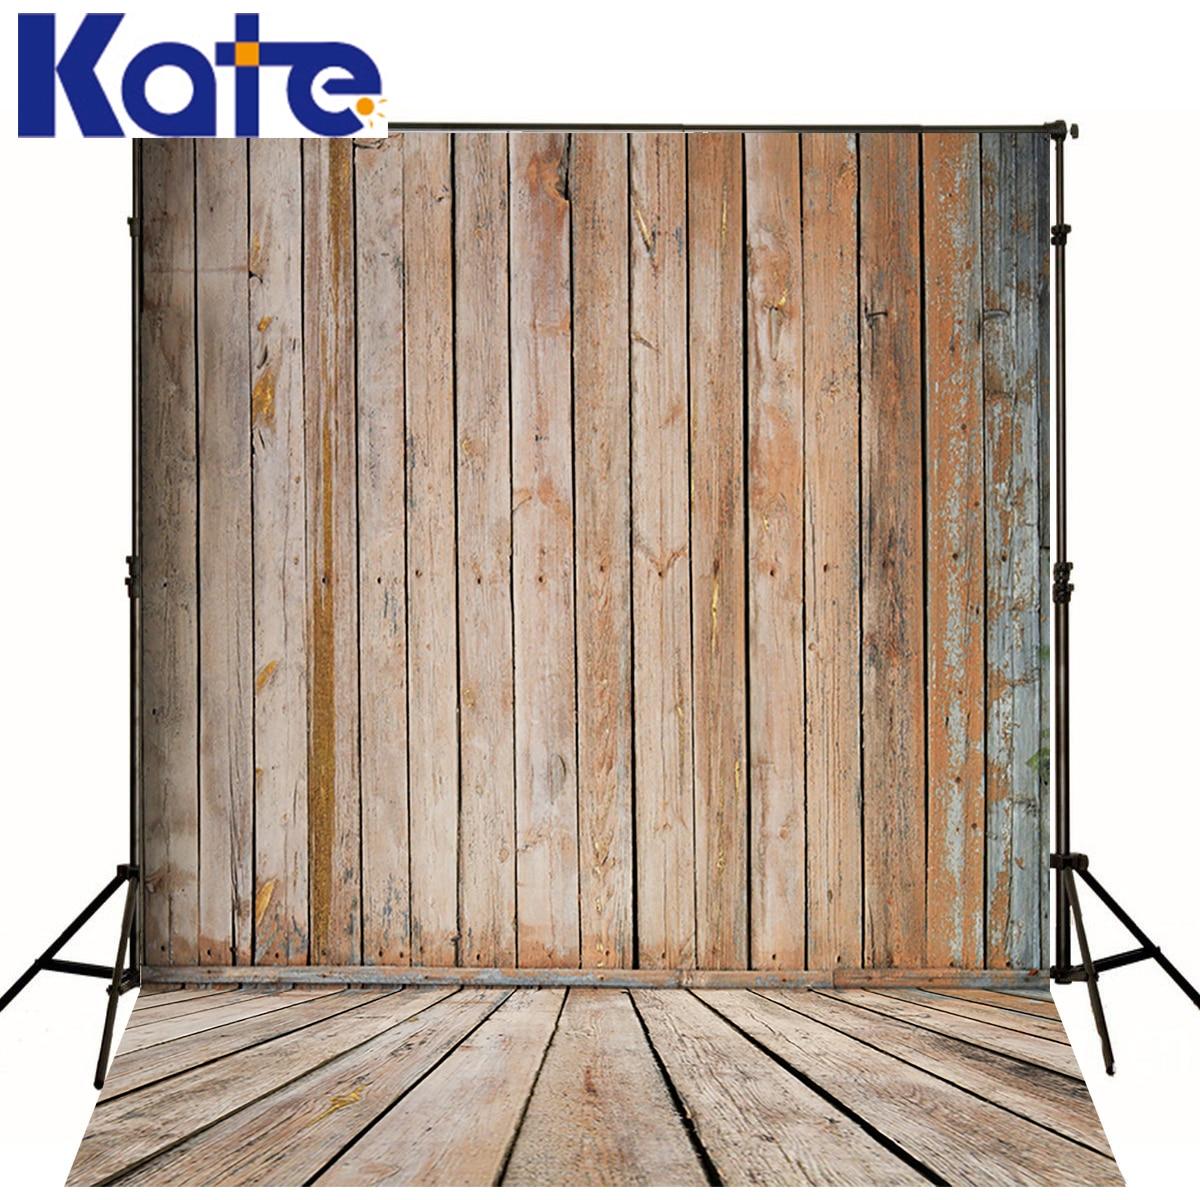 Kate Photo Backdrops Newborn Baby Yellow Wooden Wall Photography Backdrops Wood Texture Floor Backdrop For Photo Studio цена 2016